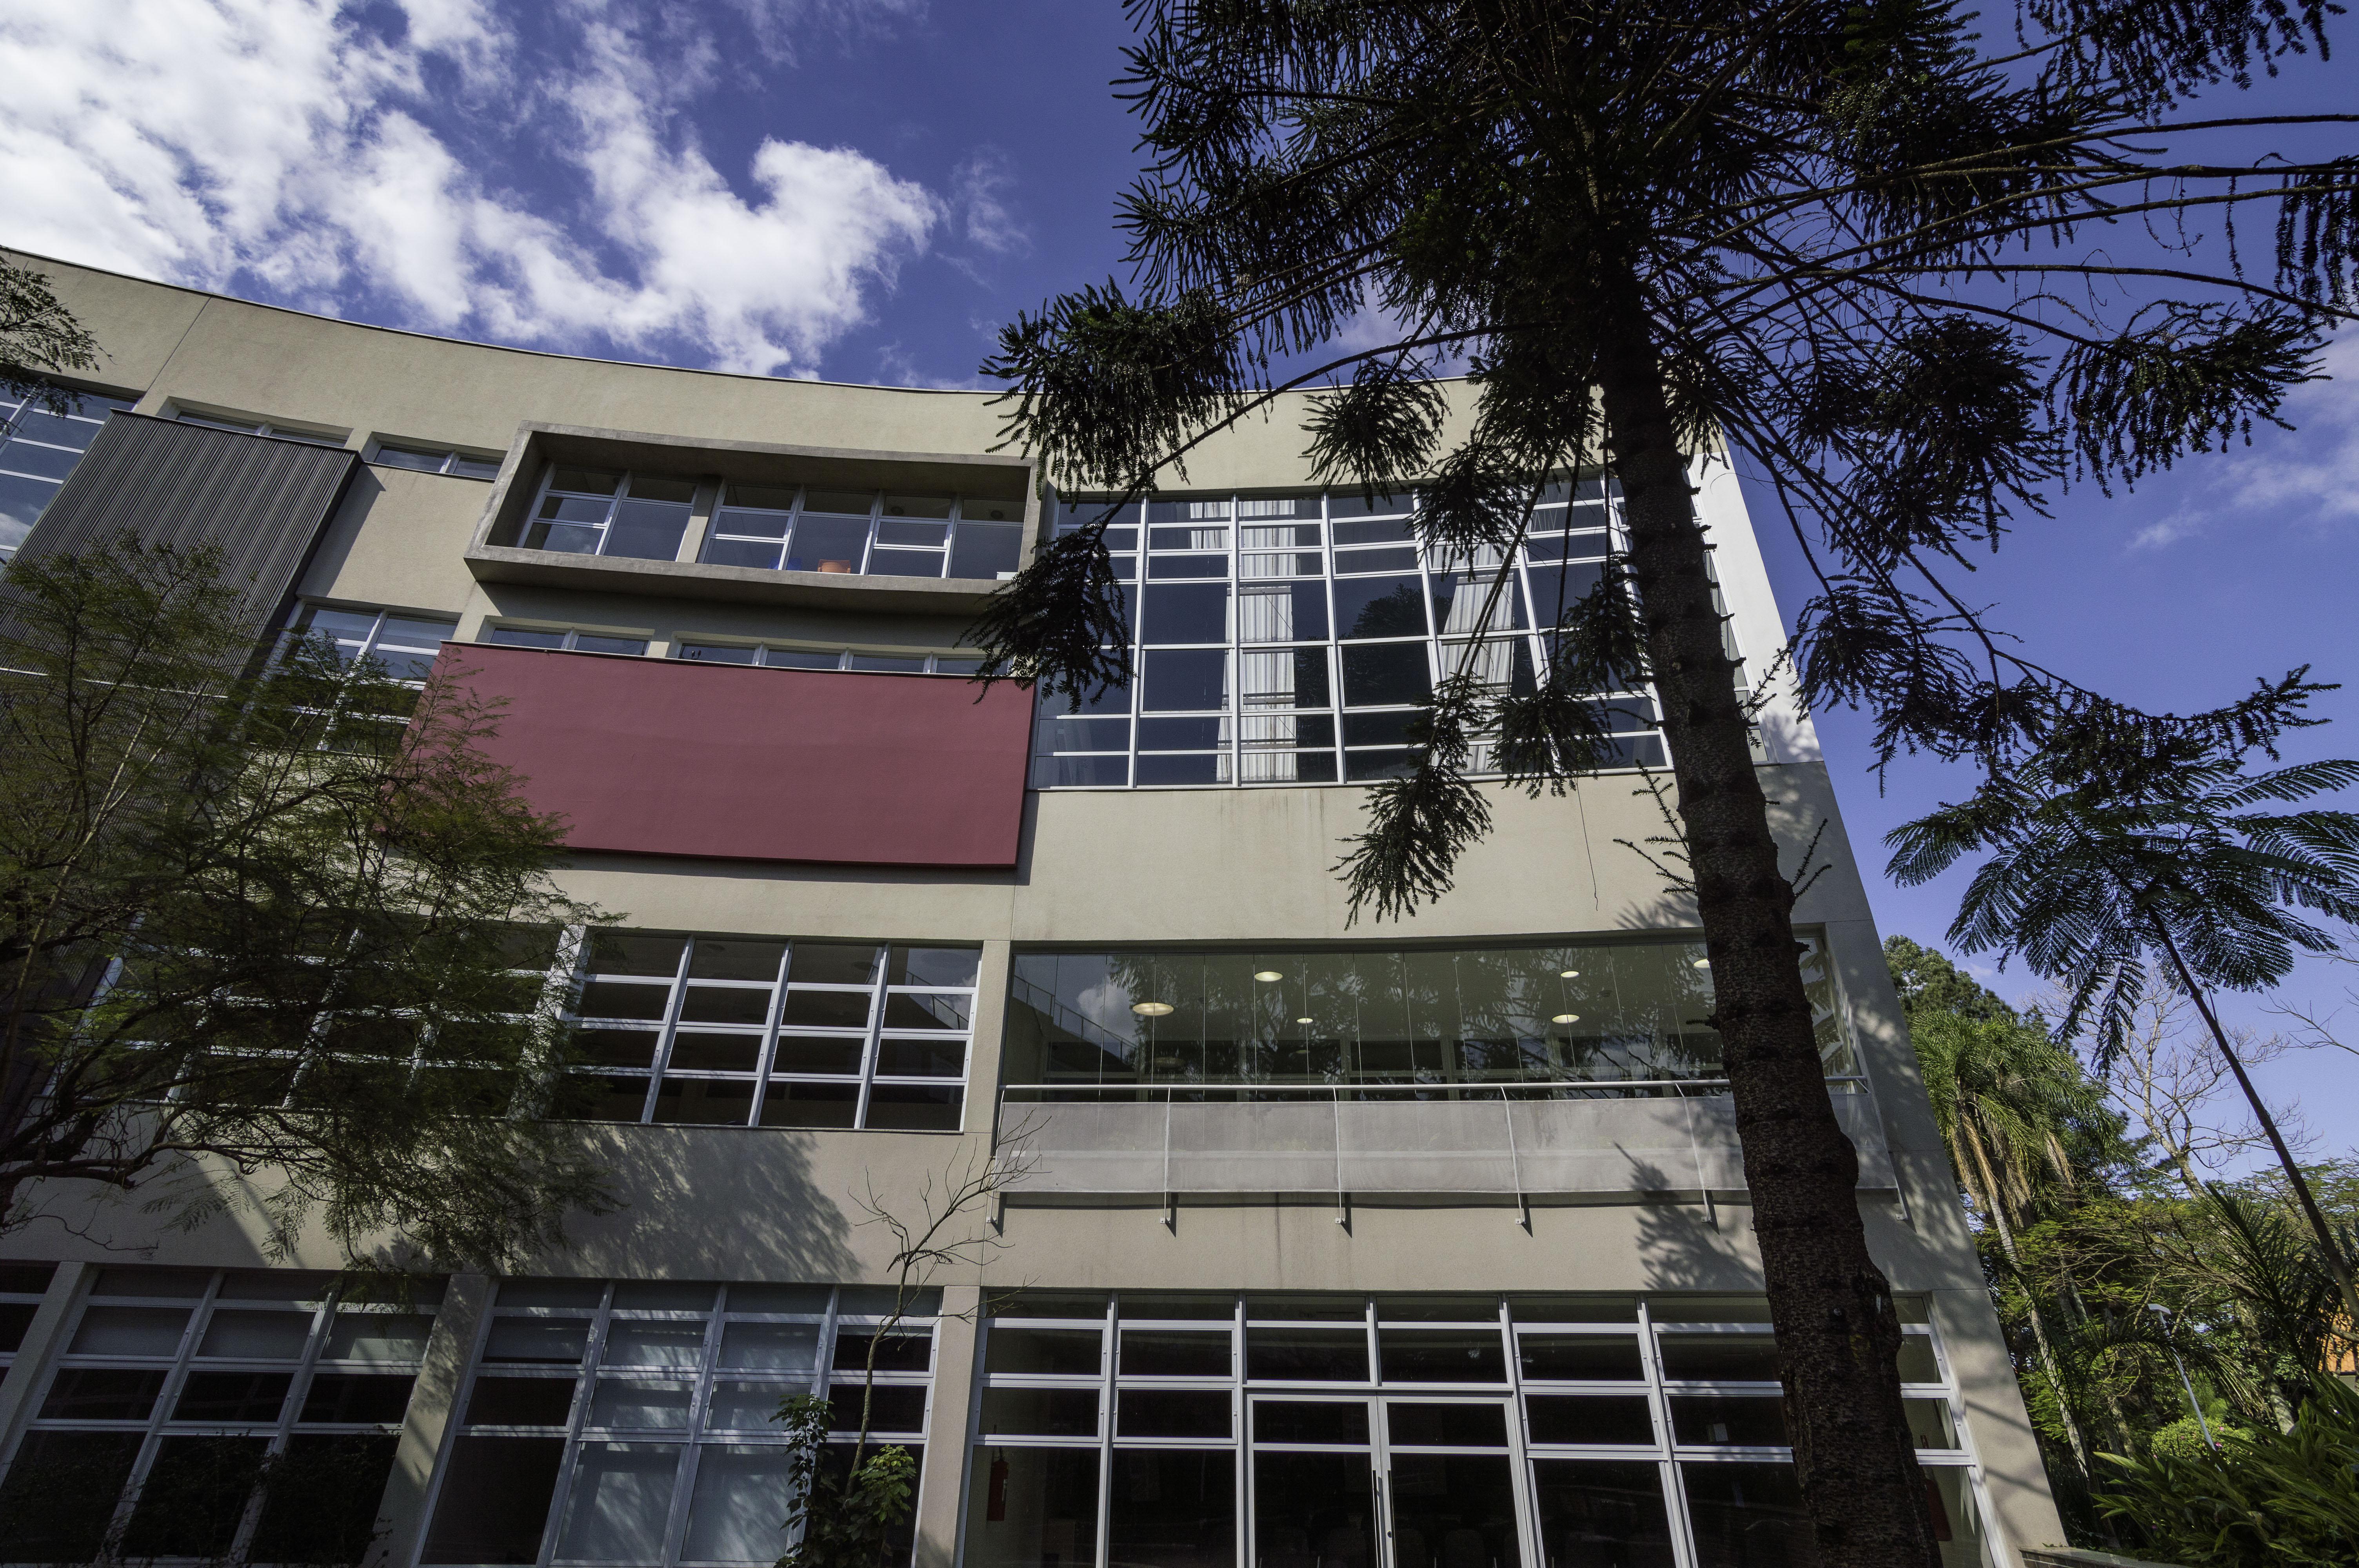 Residencial Santa Cruz 010816-311